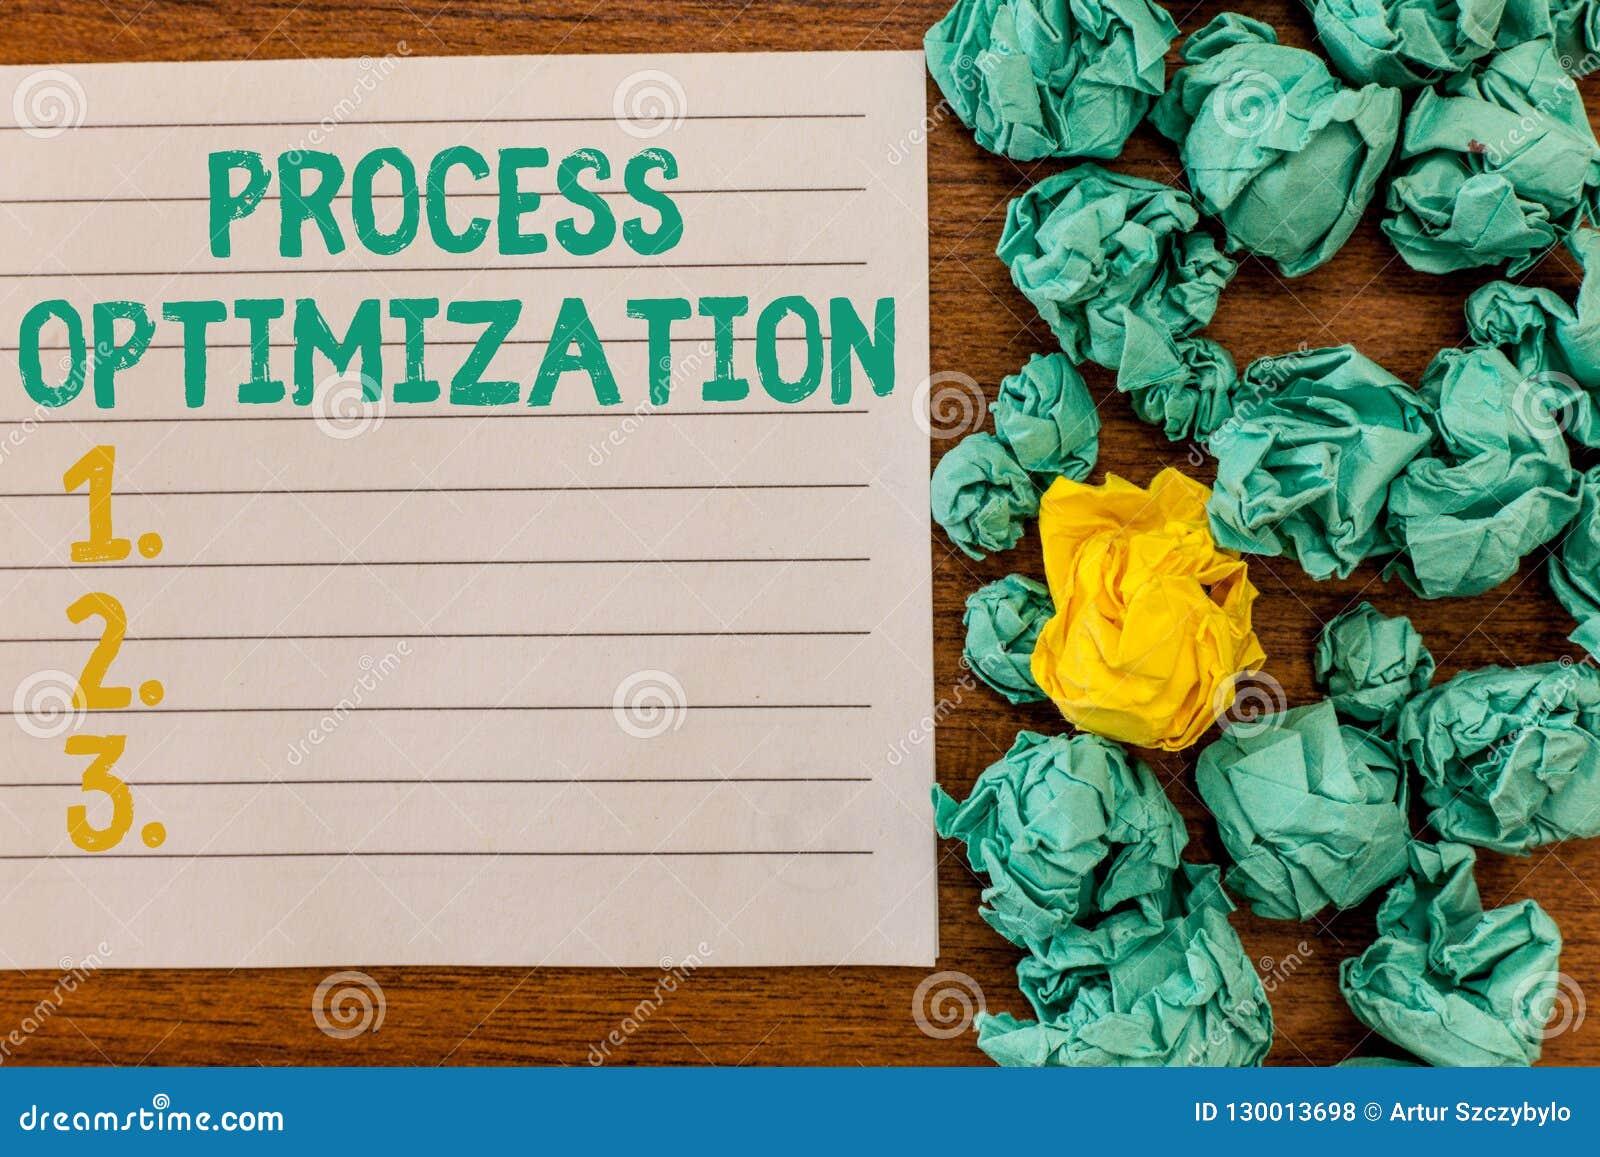 Writing note showing Process Optimization. Business photo showcasing Improve Organizations Efficiency Maximize